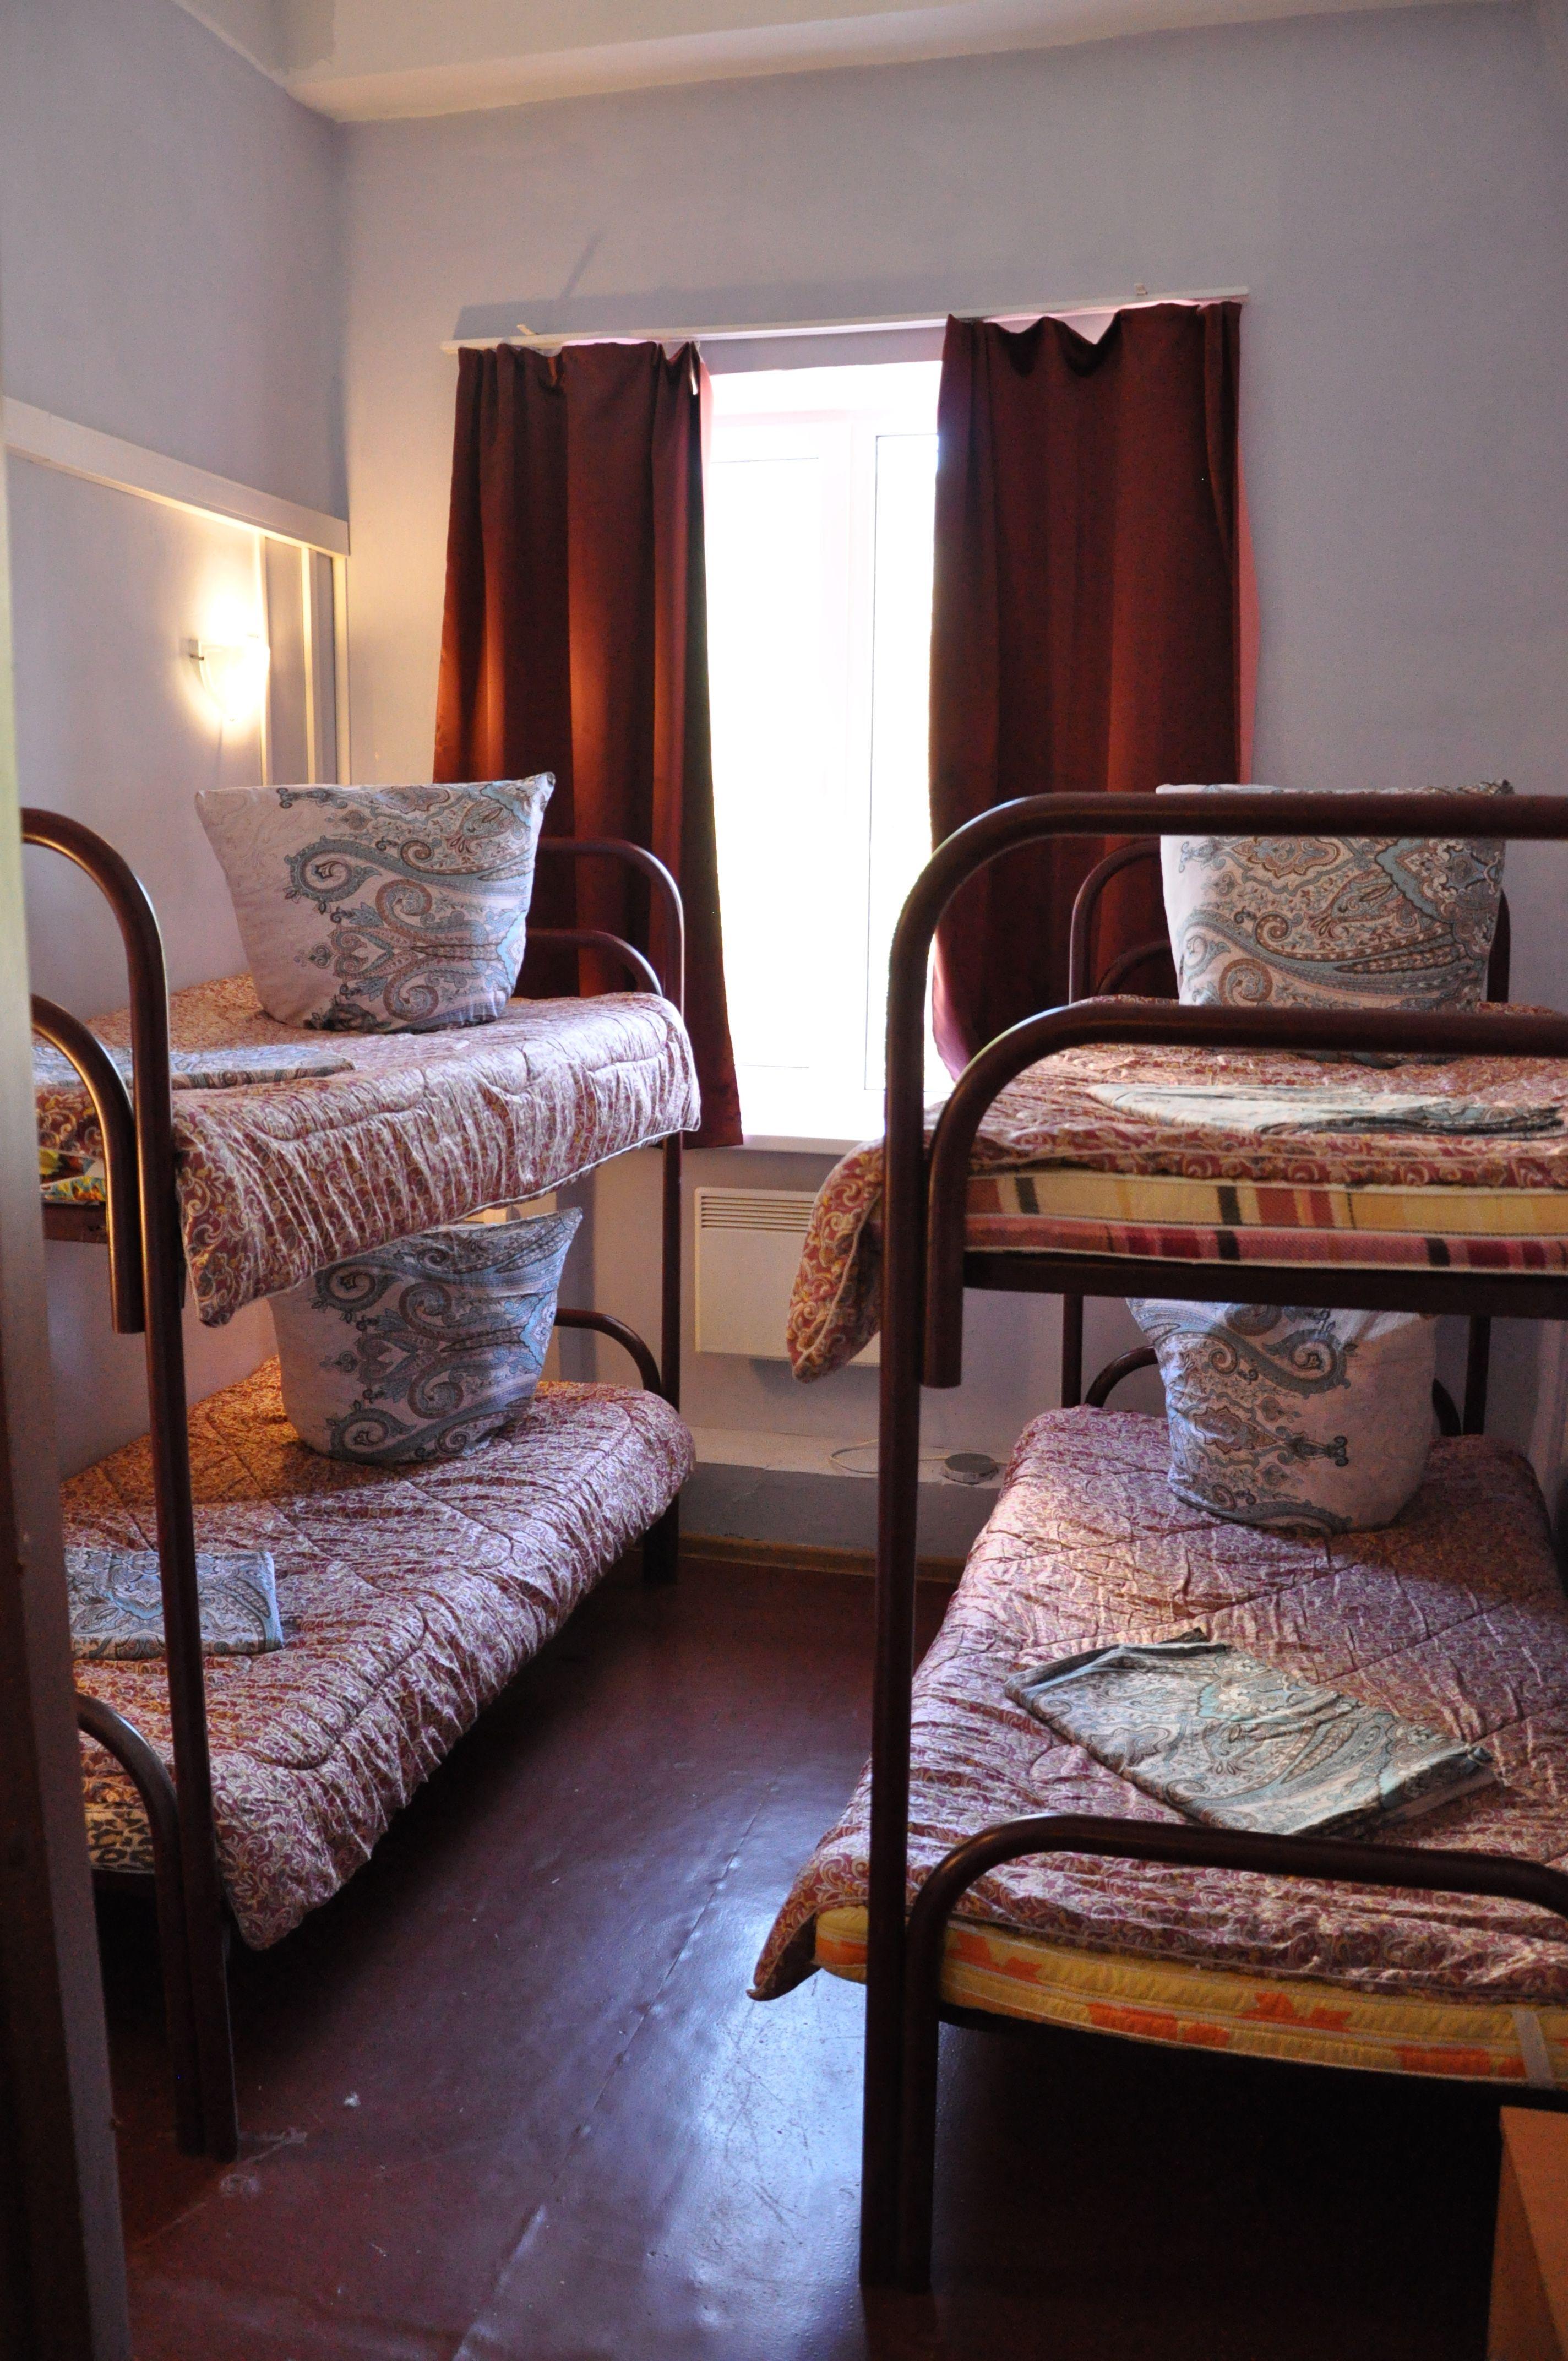 Снять комнату в хостеле на 4 места